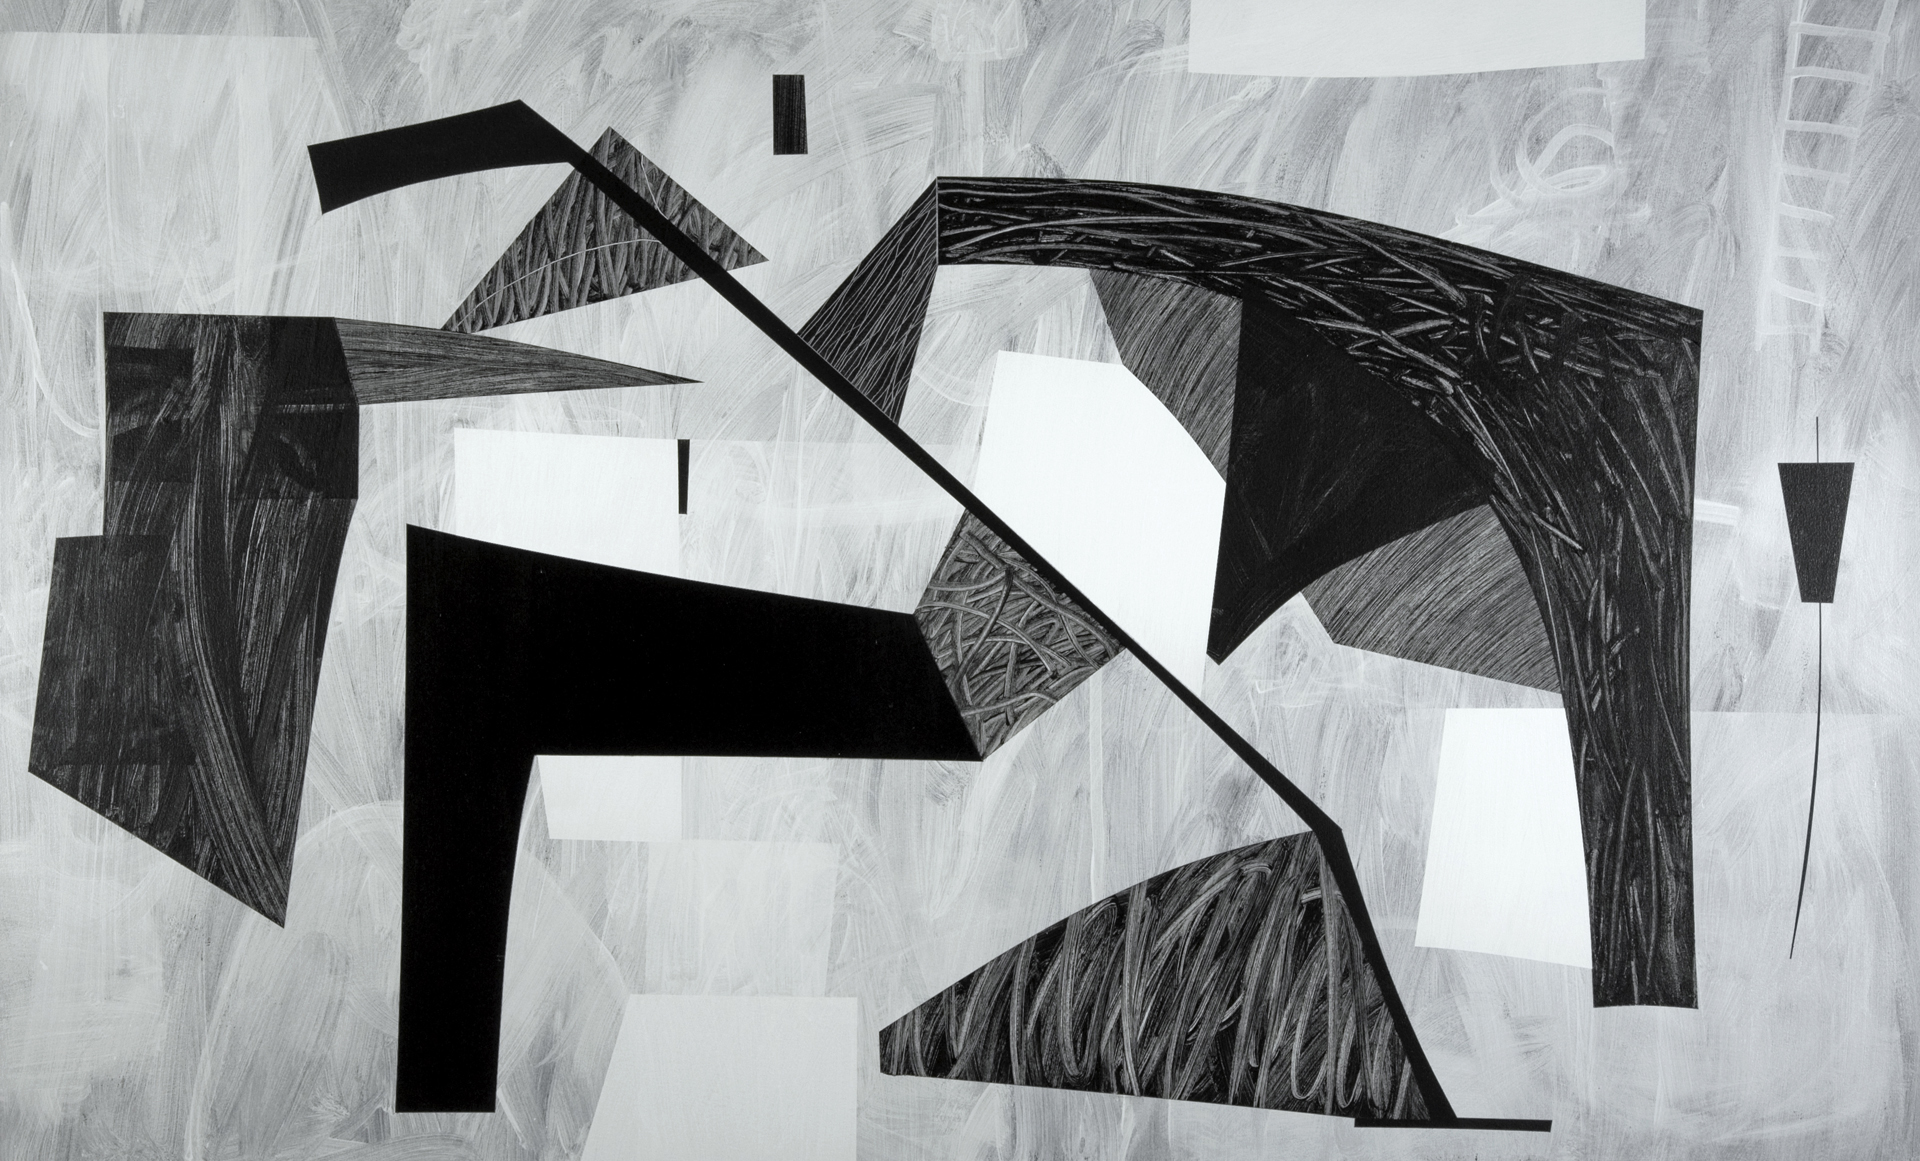 Strange Meadowlark, 2009